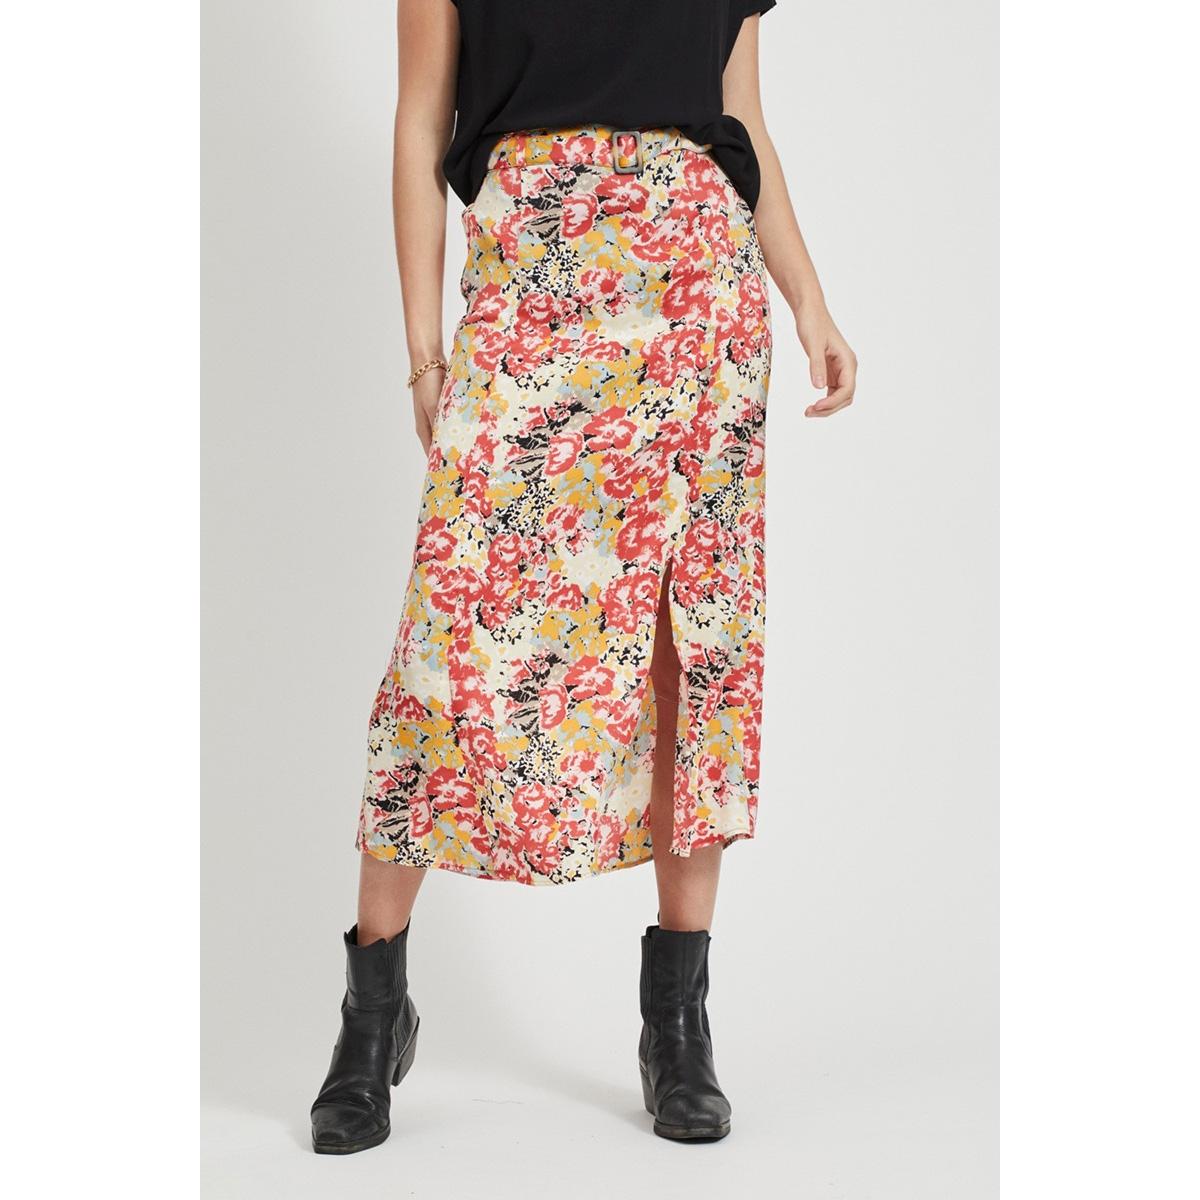 objjolly skirt 108 23032198 object rok tandori spice/multi color